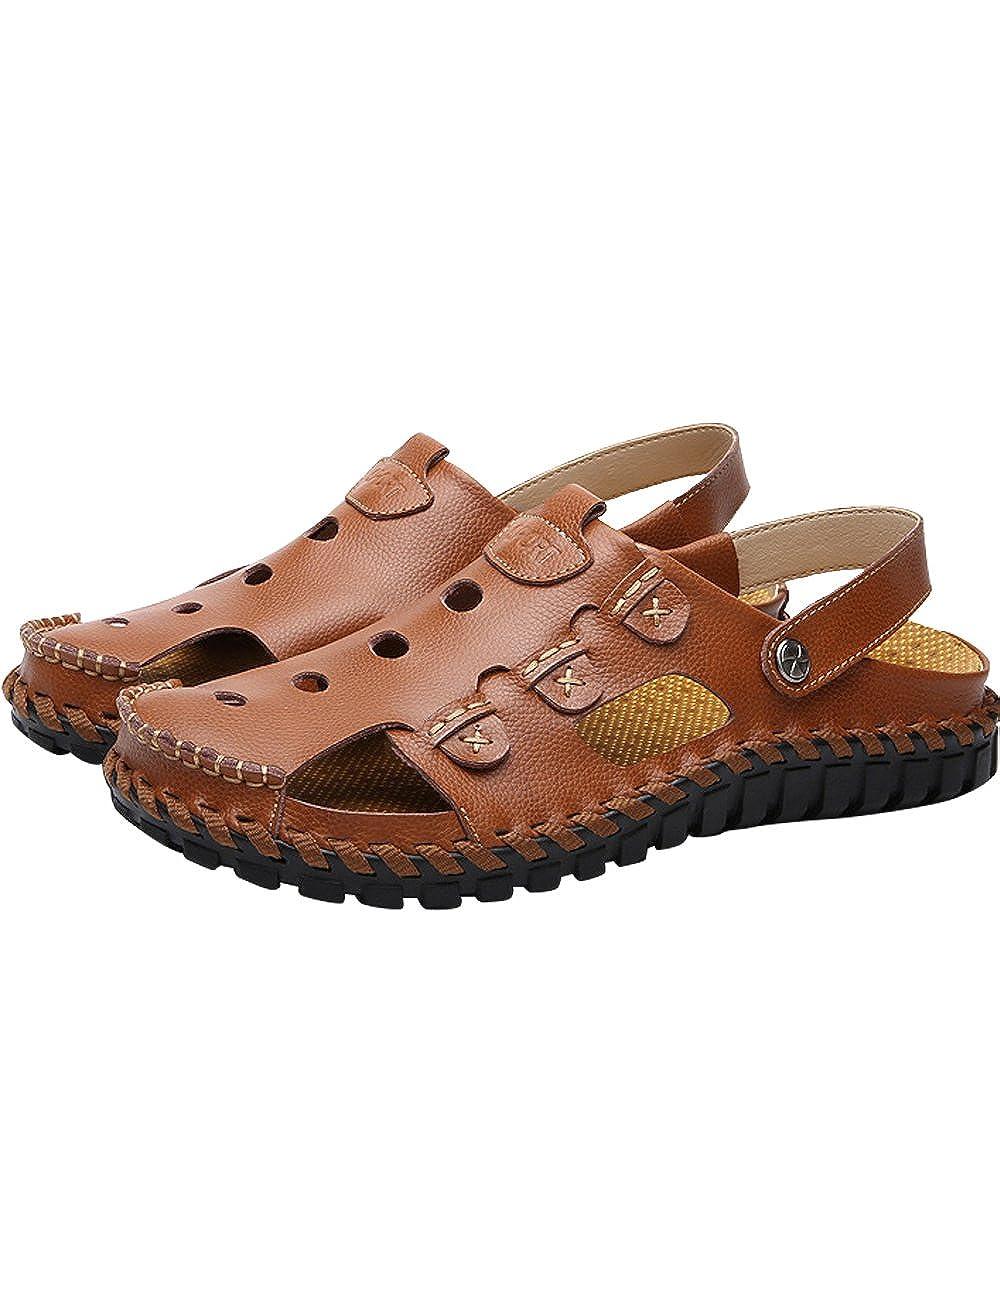 Sandalen Herrenchwear Herren Leder Sport Sandalen  Outdoor Wasserschuhe Schuhe Rose-braun-tx9918 a39632